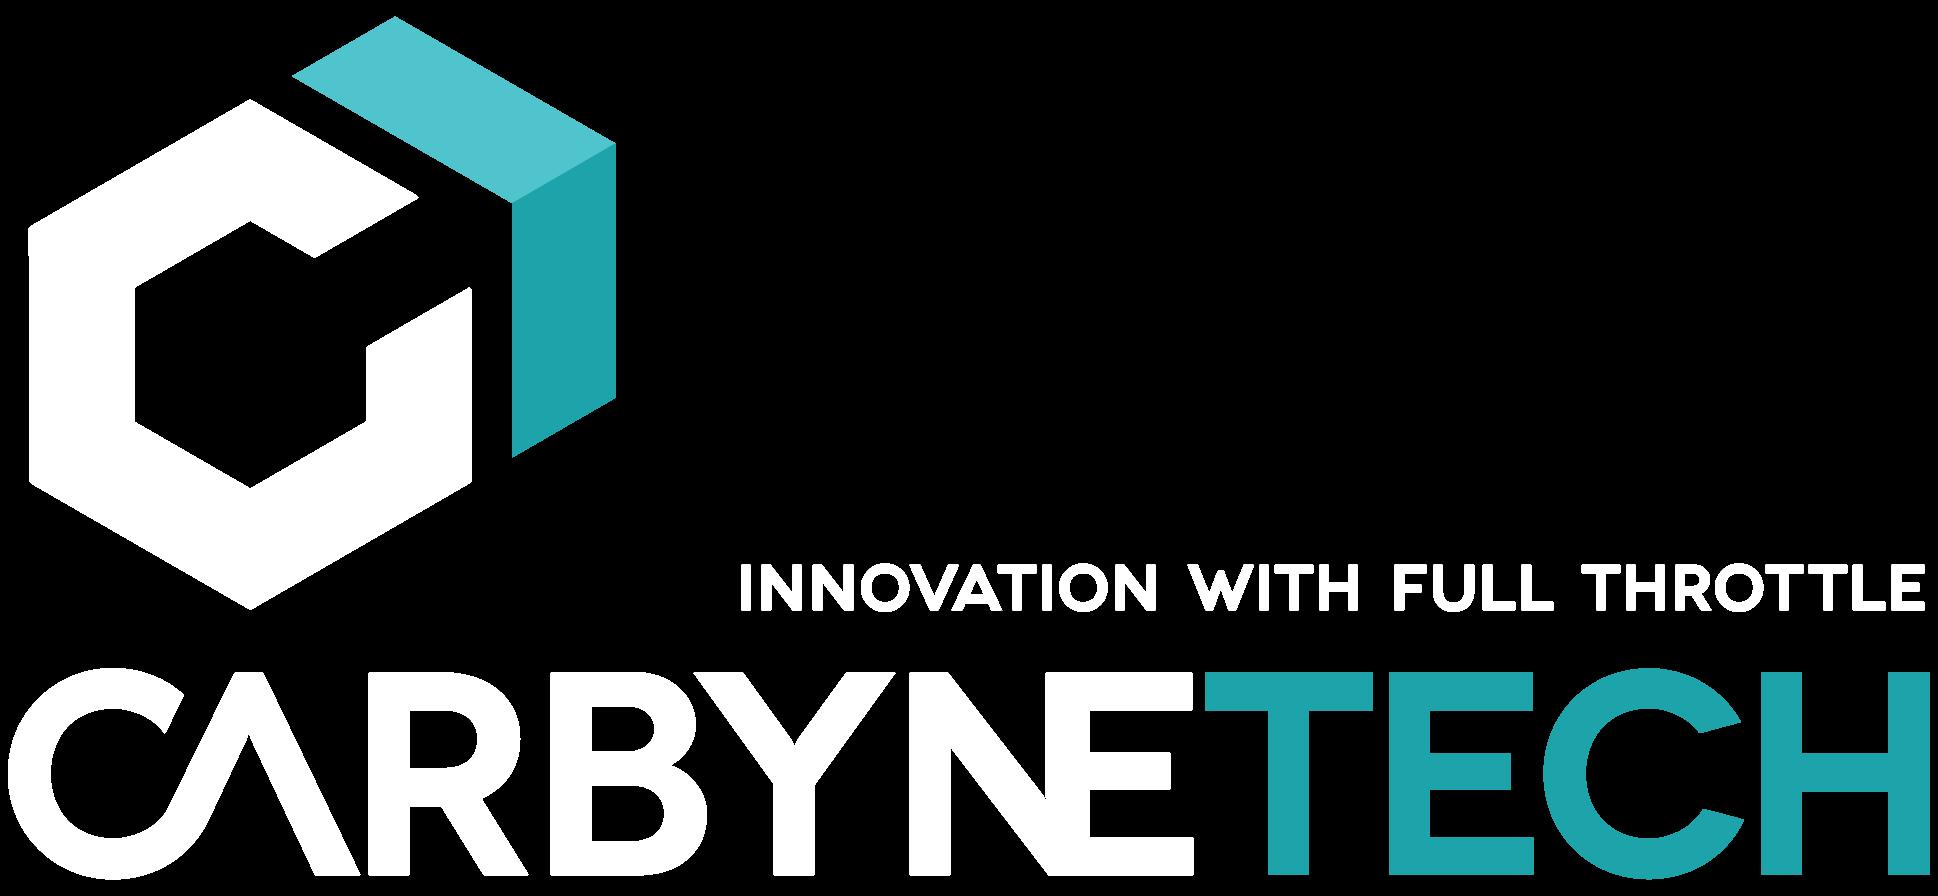 Carbyne Tech - Sap company logo